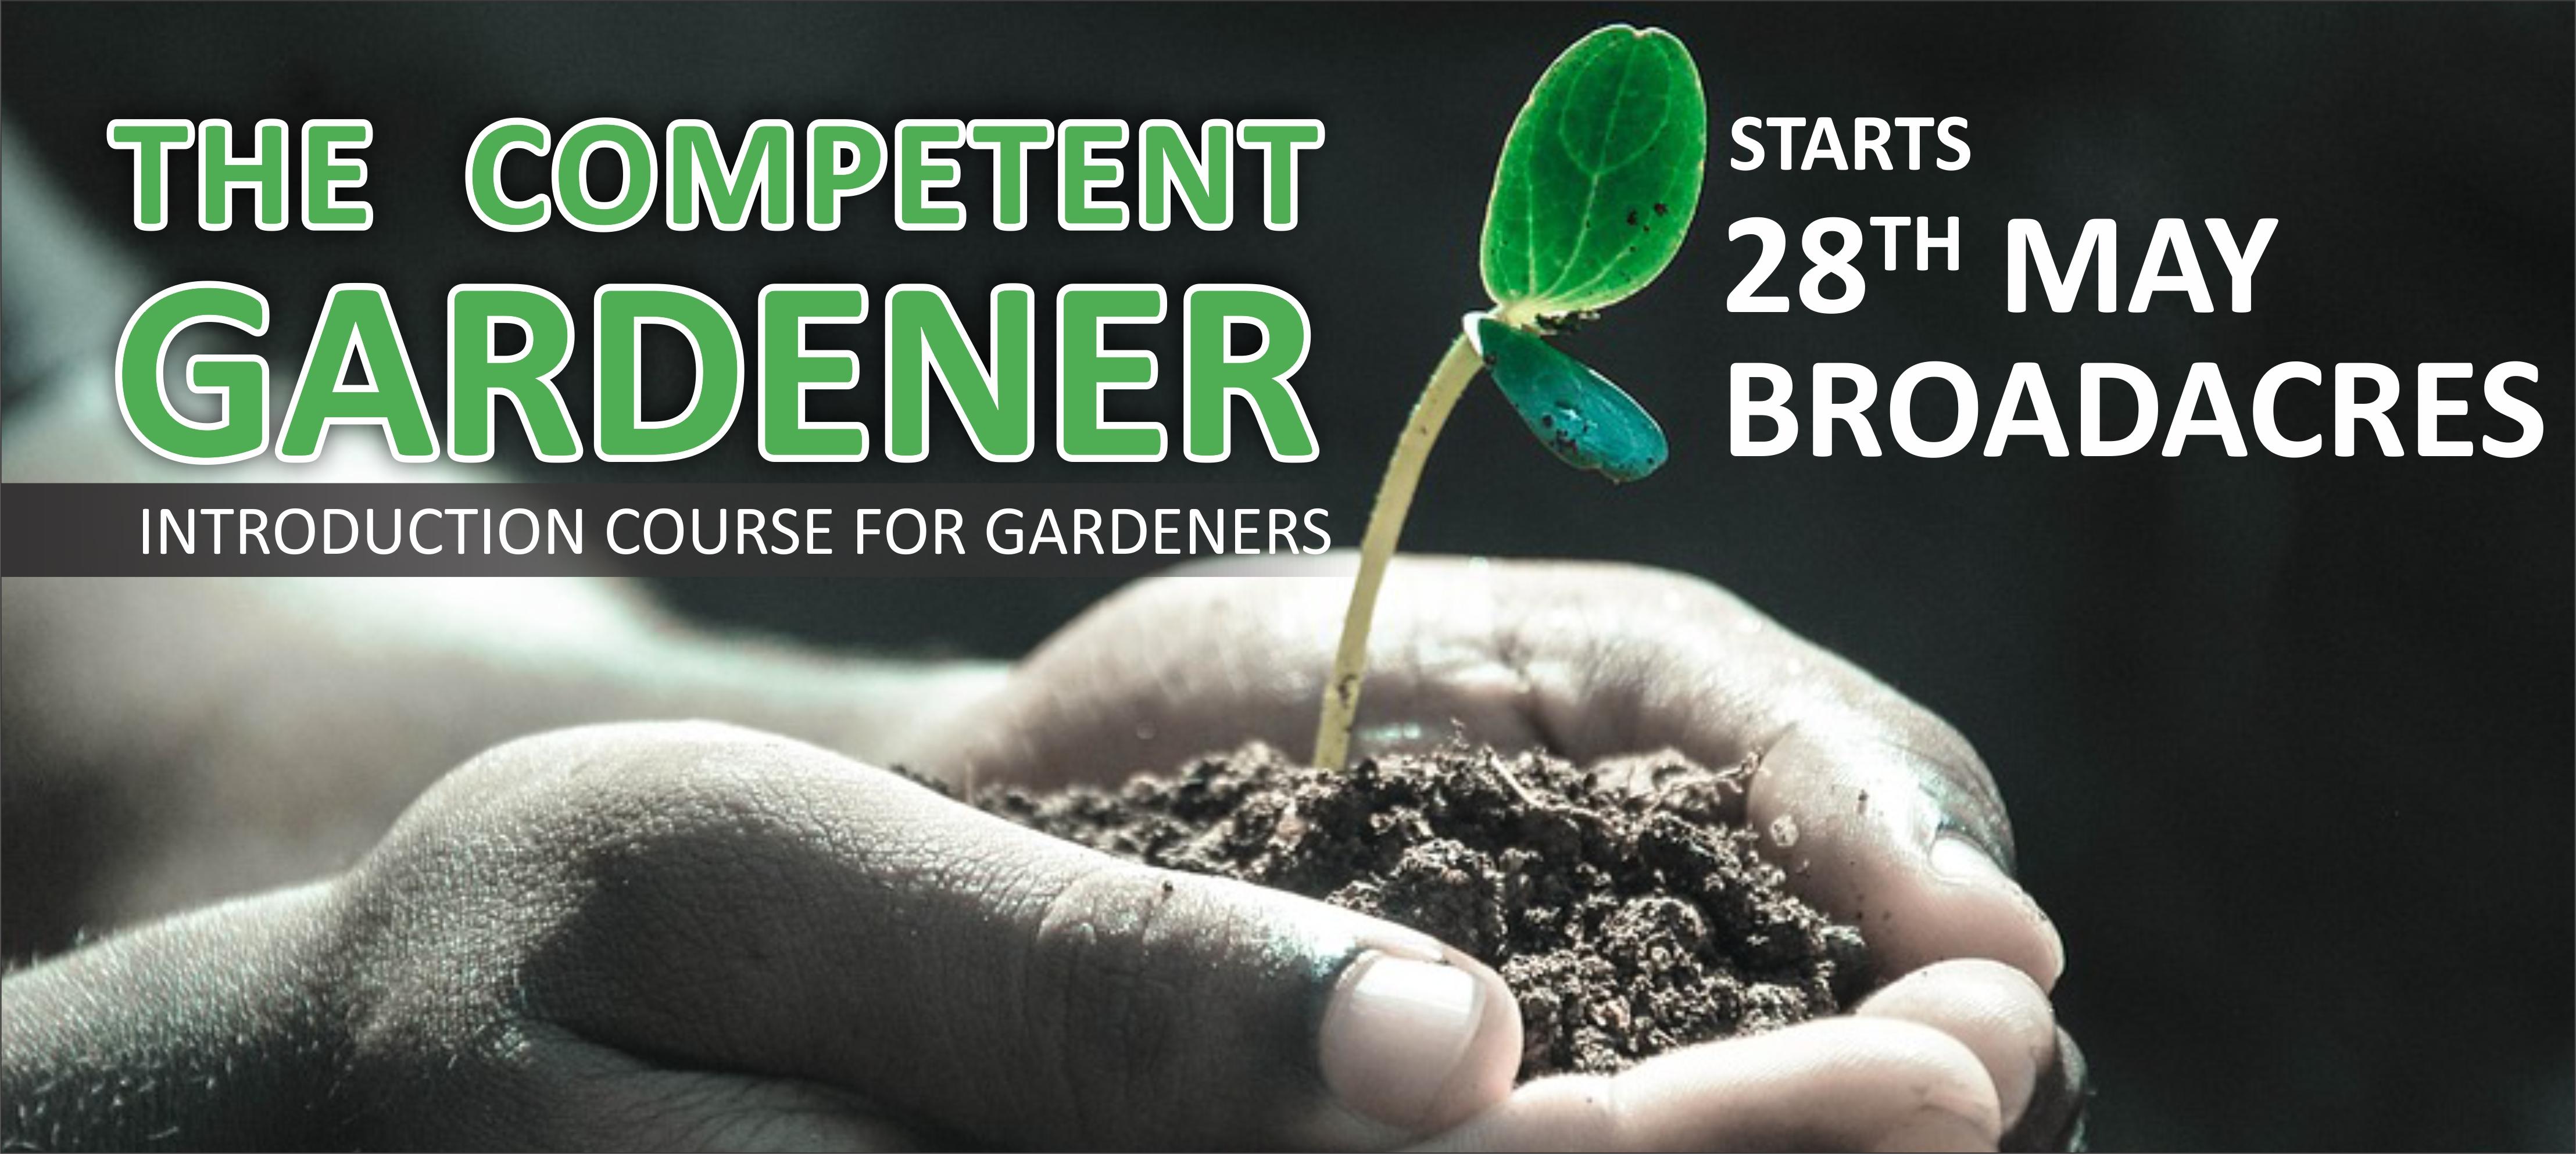 Gardeners course BDS 2019